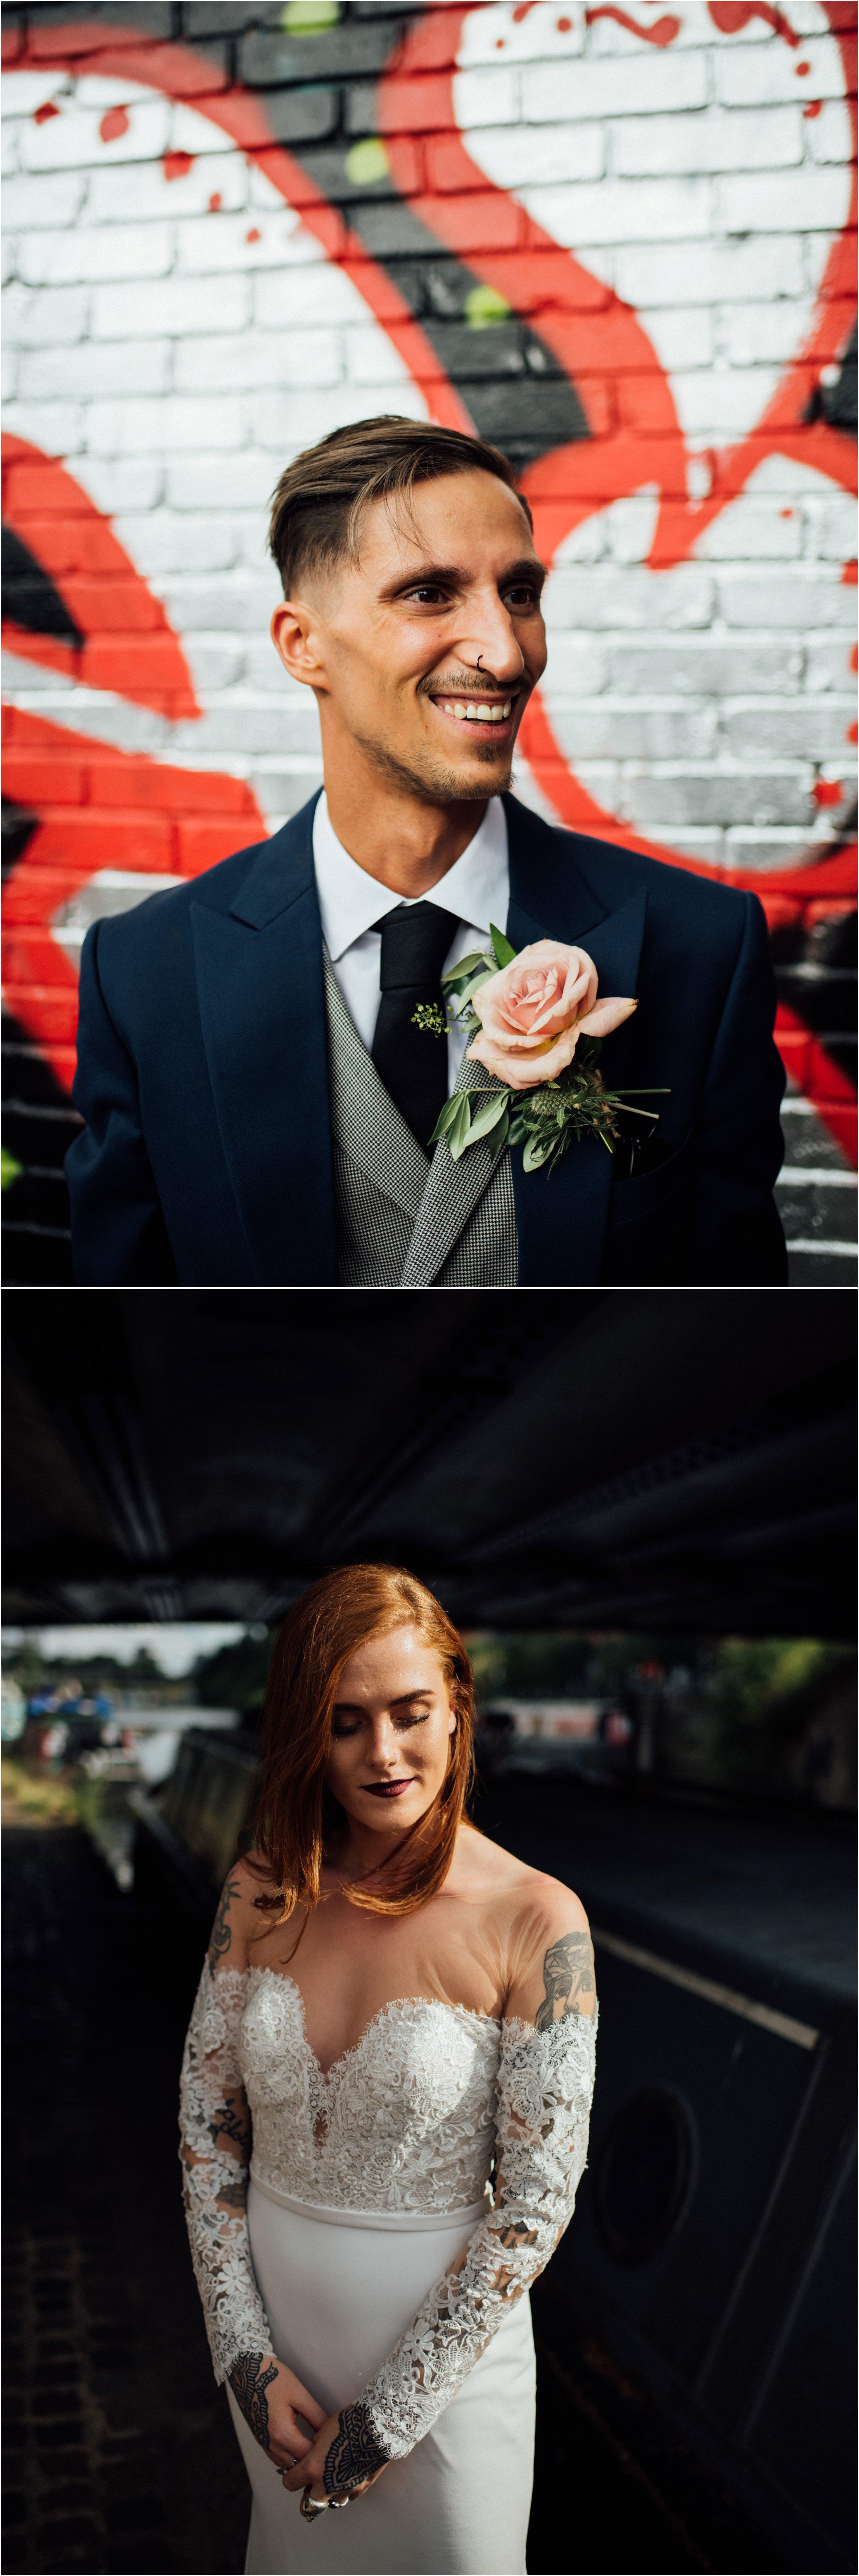 Hackney town hall wedding photography_0137.jpg